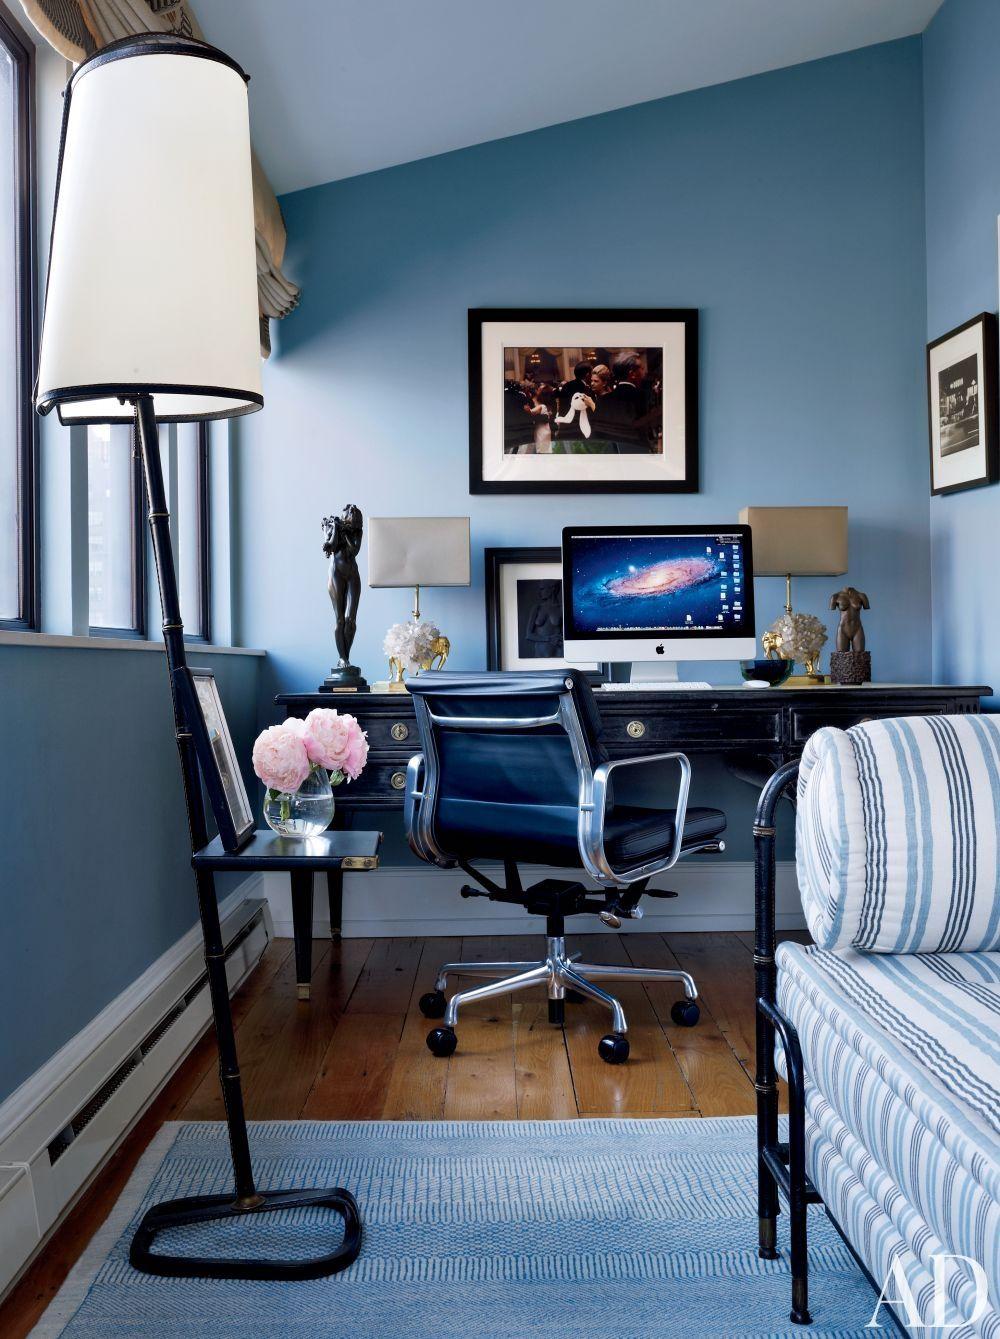 Interior decorating design ideas inspirations photos DIY